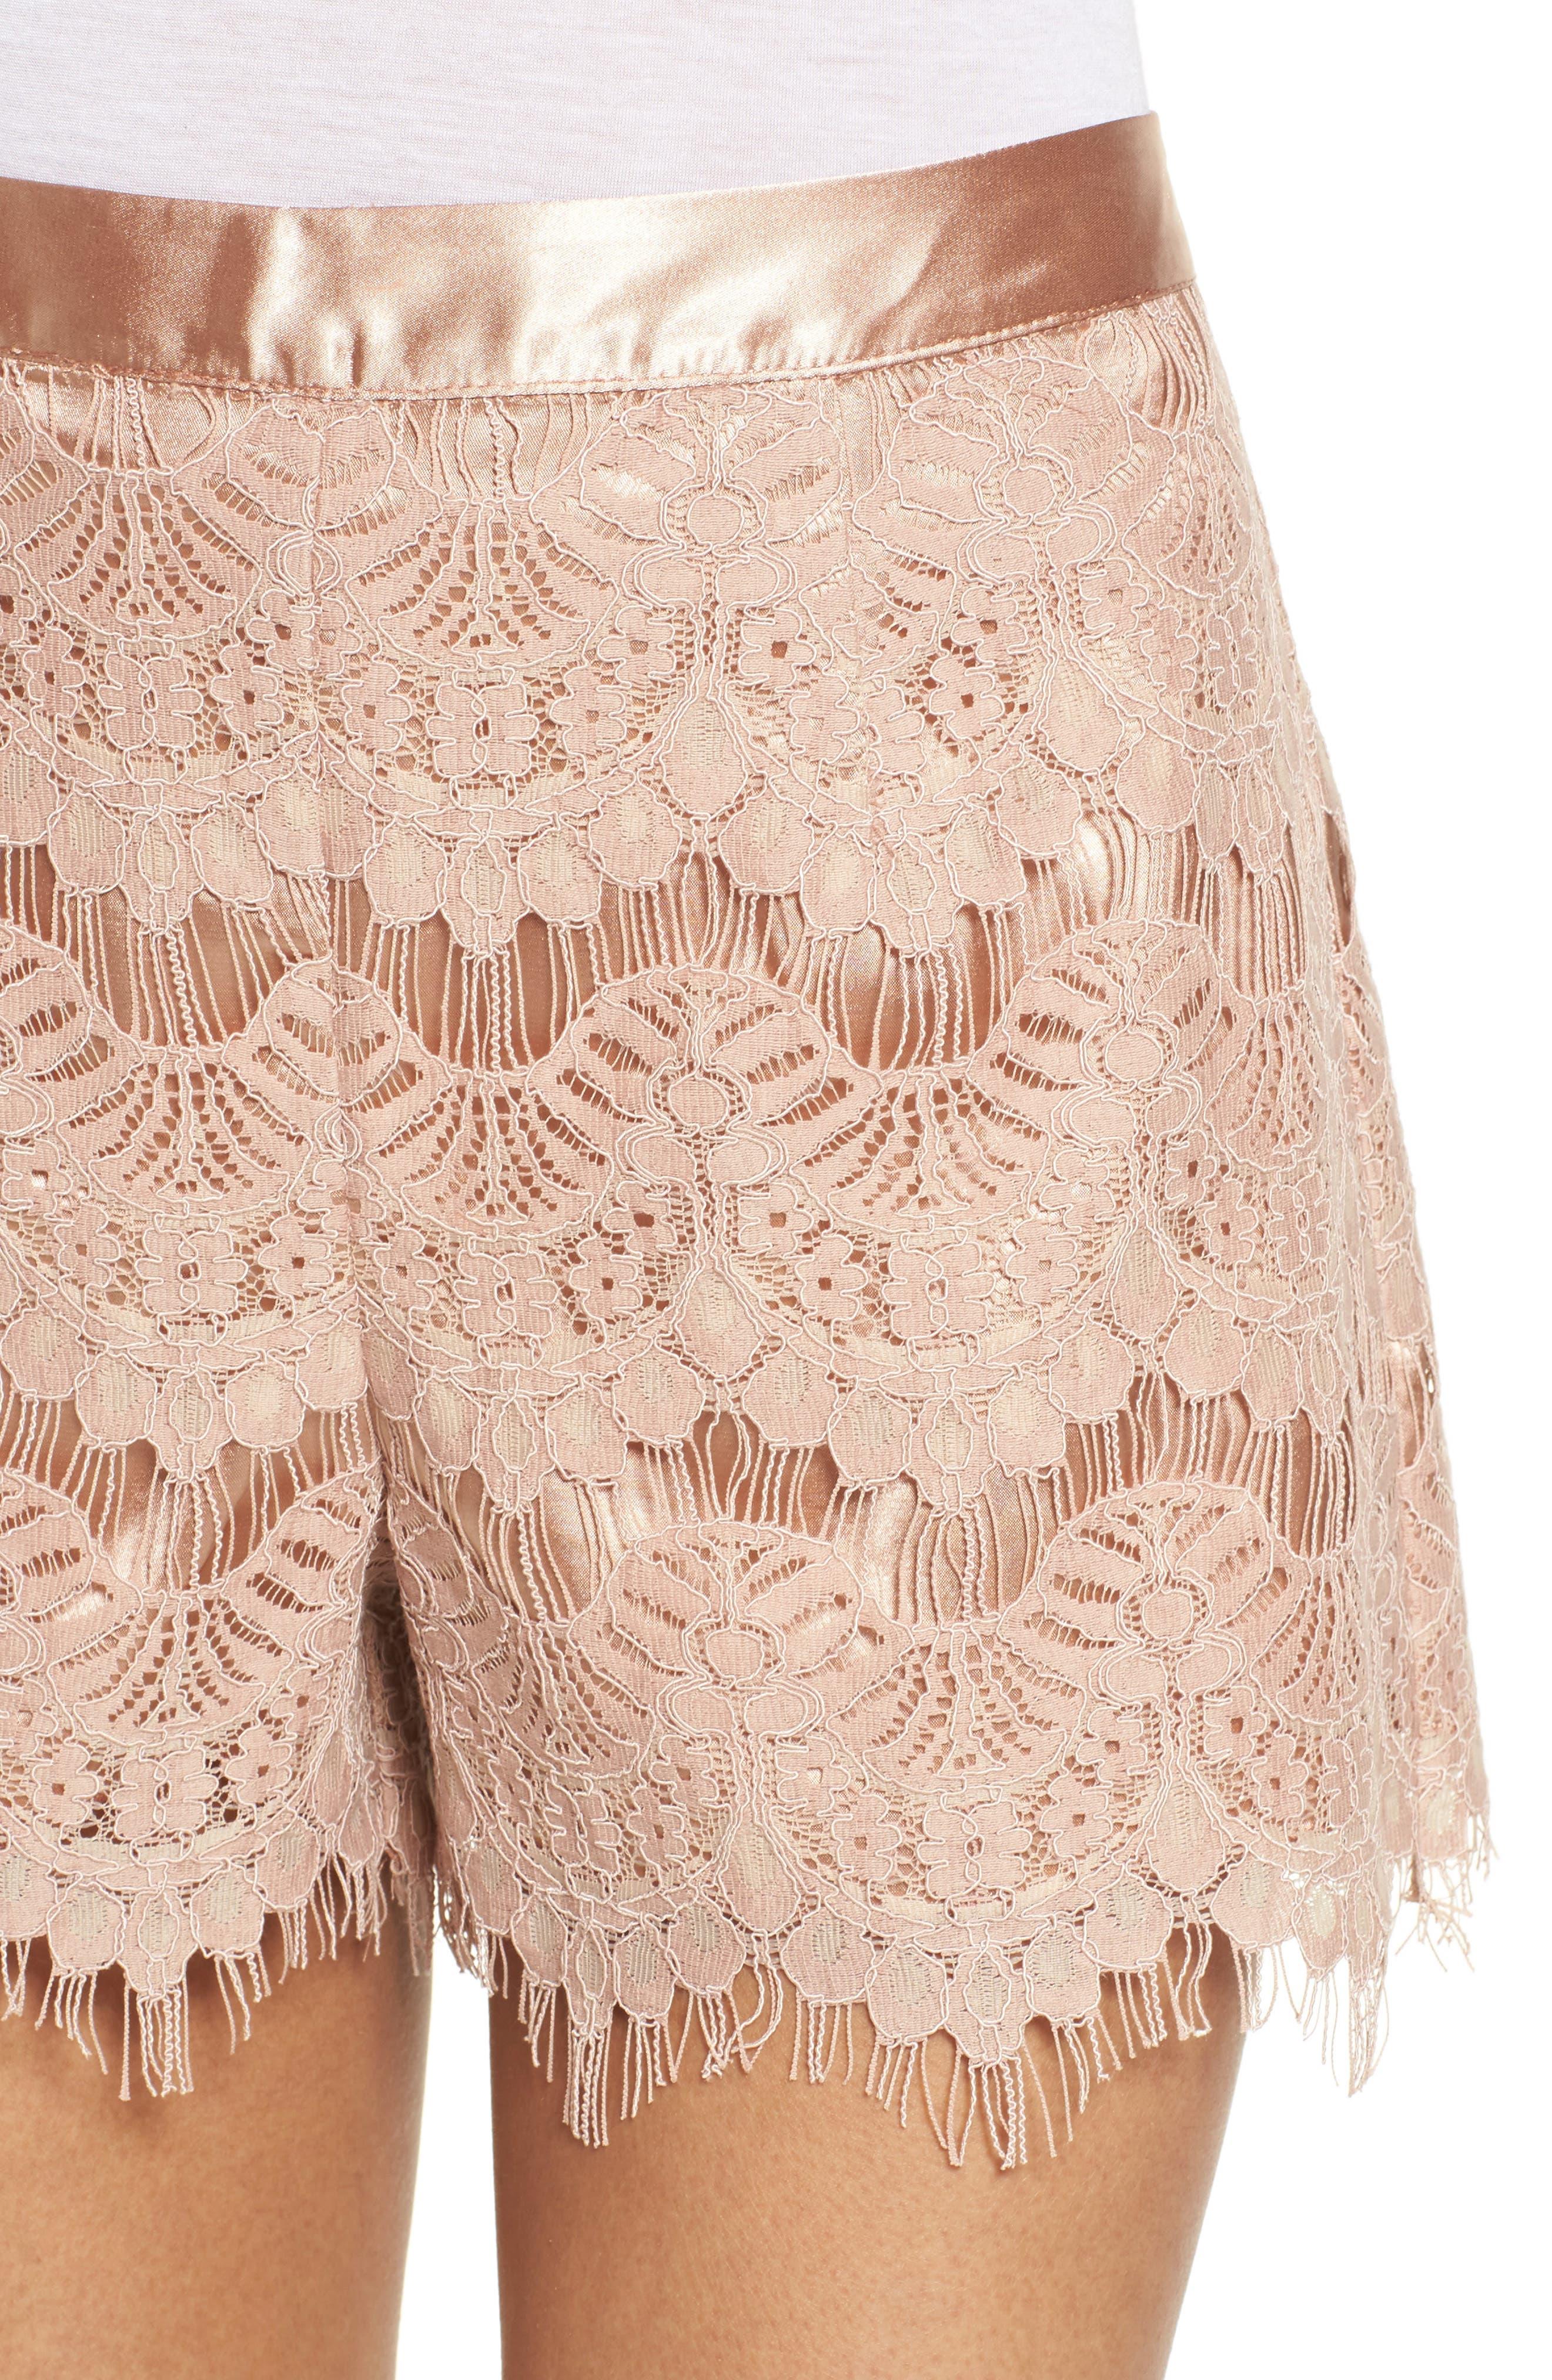 Lace Shorts,                             Alternate thumbnail 4, color,                             680